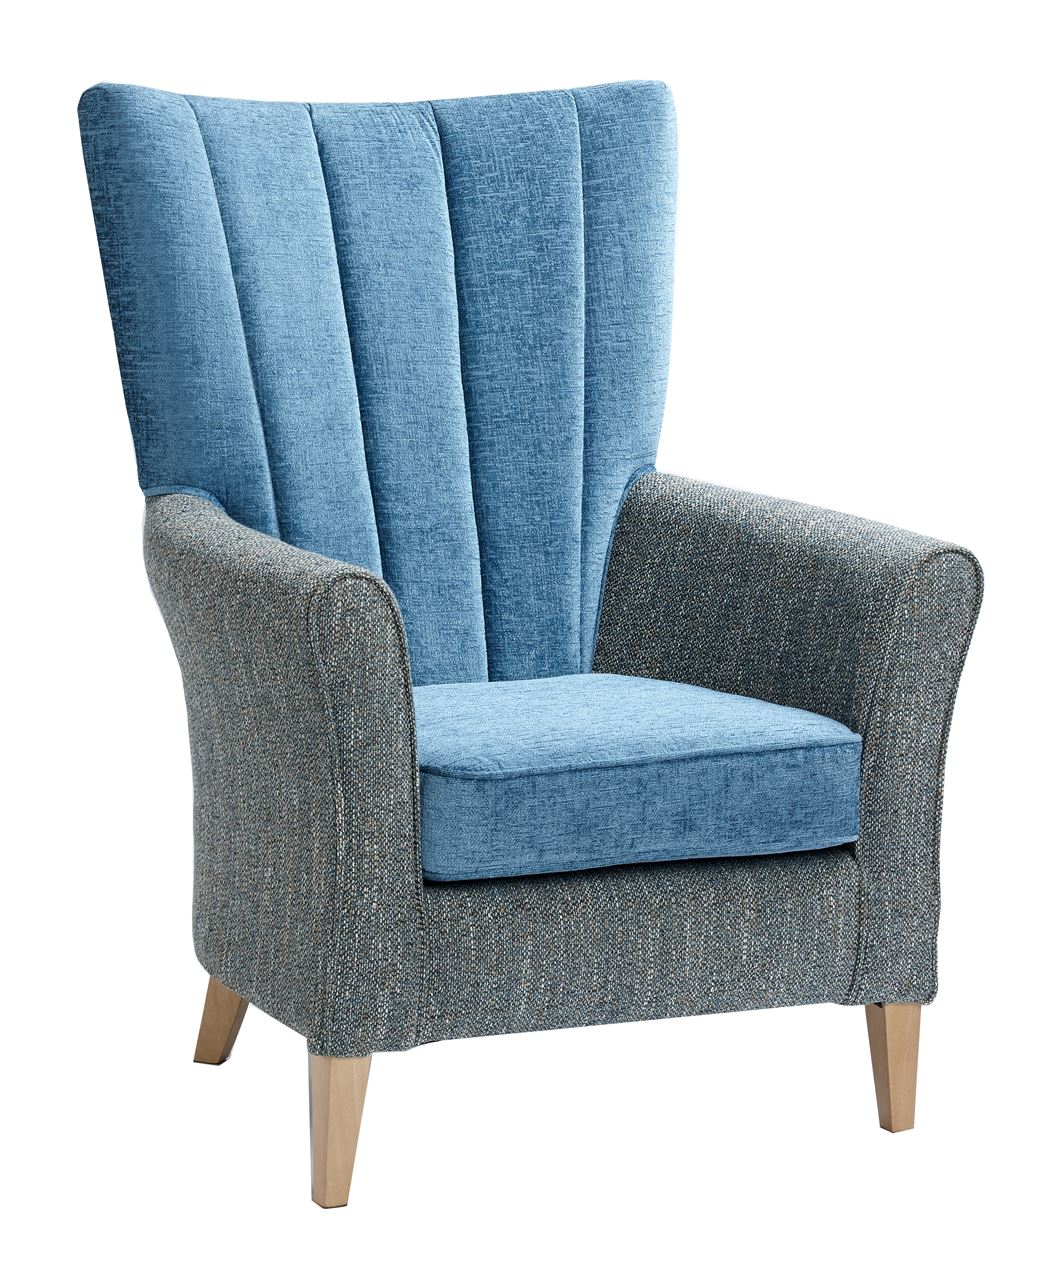 Fantastic Broxton High Back Armchair Renray Healthcare Beatyapartments Chair Design Images Beatyapartmentscom